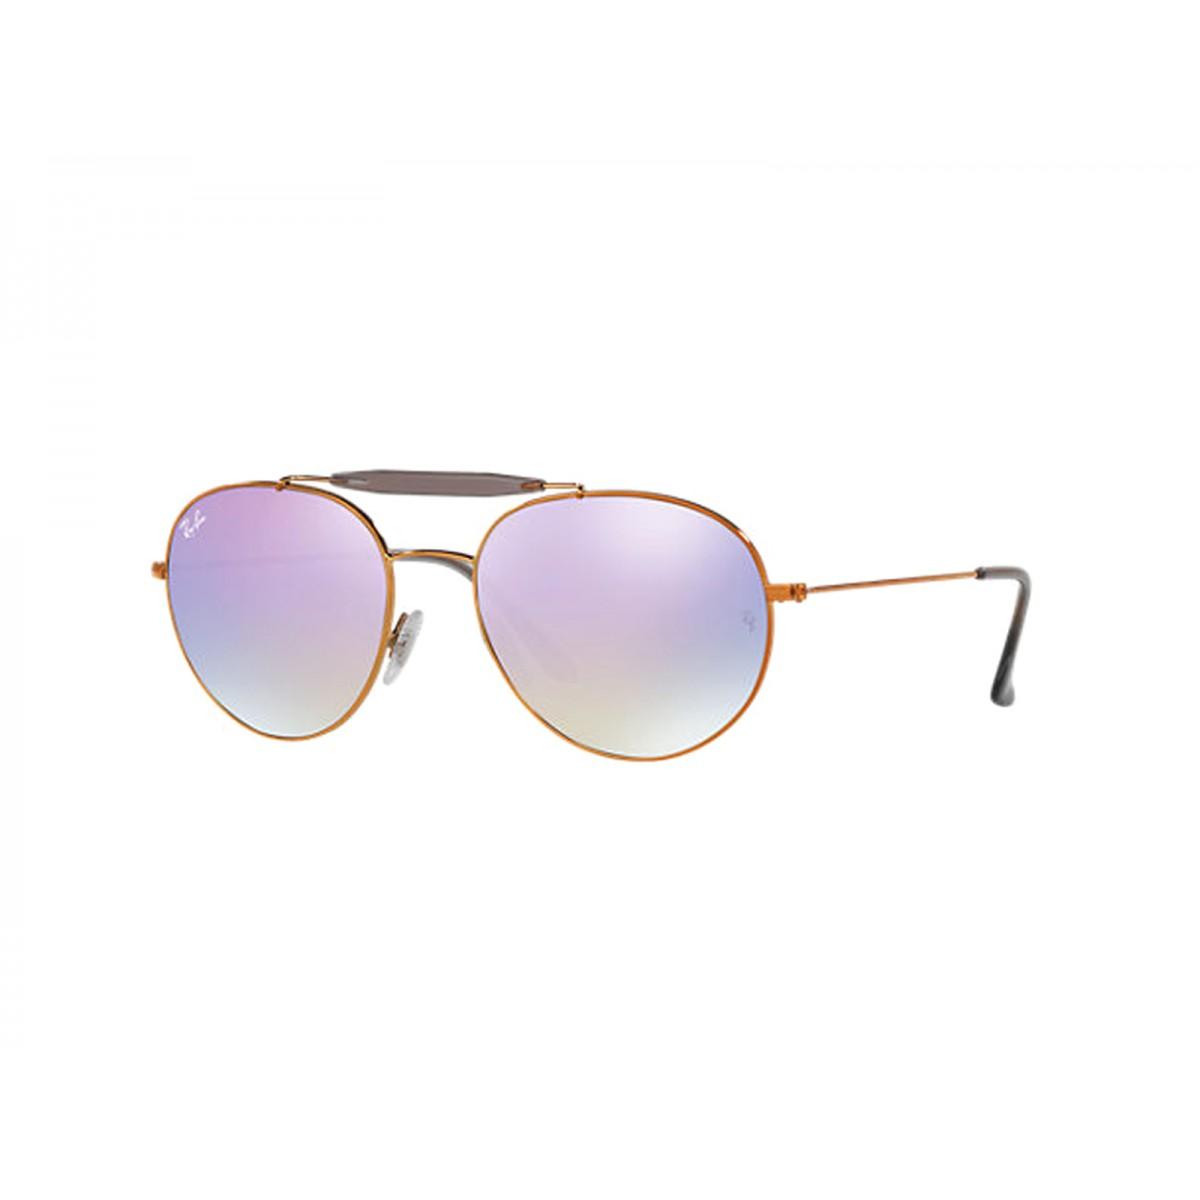 db48a3afdd Ray Ban Round Double Bridge Unisex Sunglasses RB3540-198 7X - Sunglasses -  Fashion World